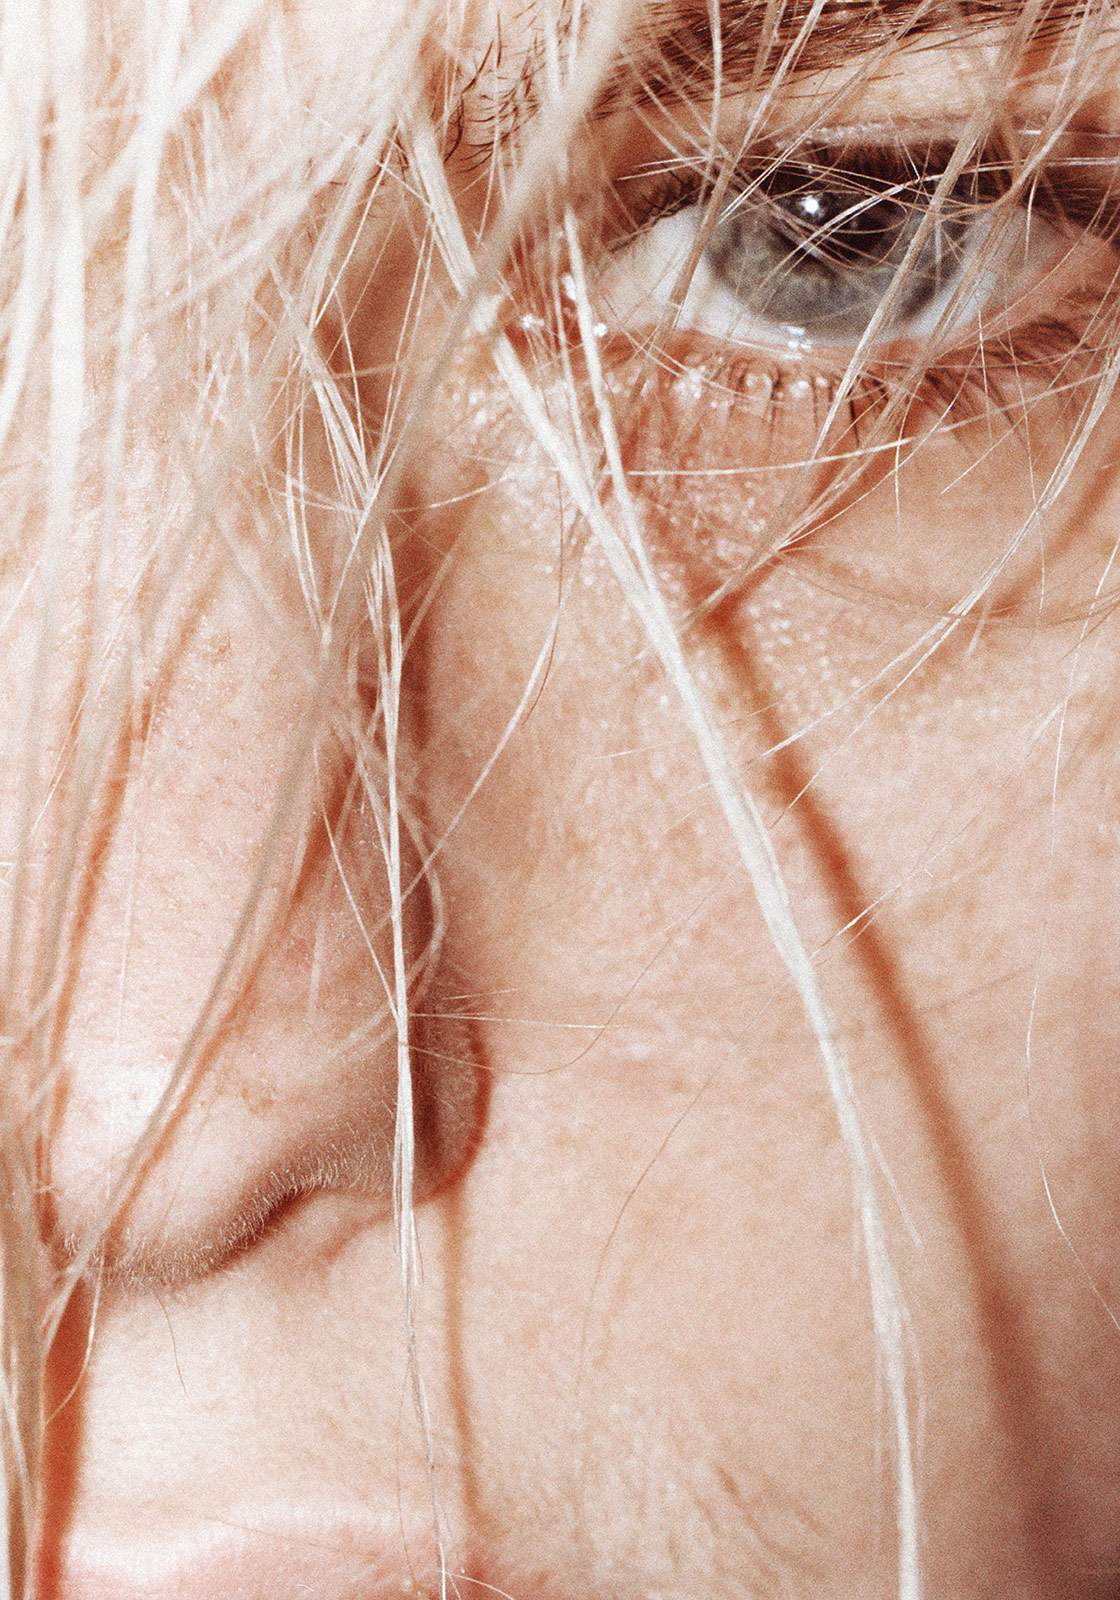 Le fotografie esplicite di Peter Kaaden | Collater.al 20